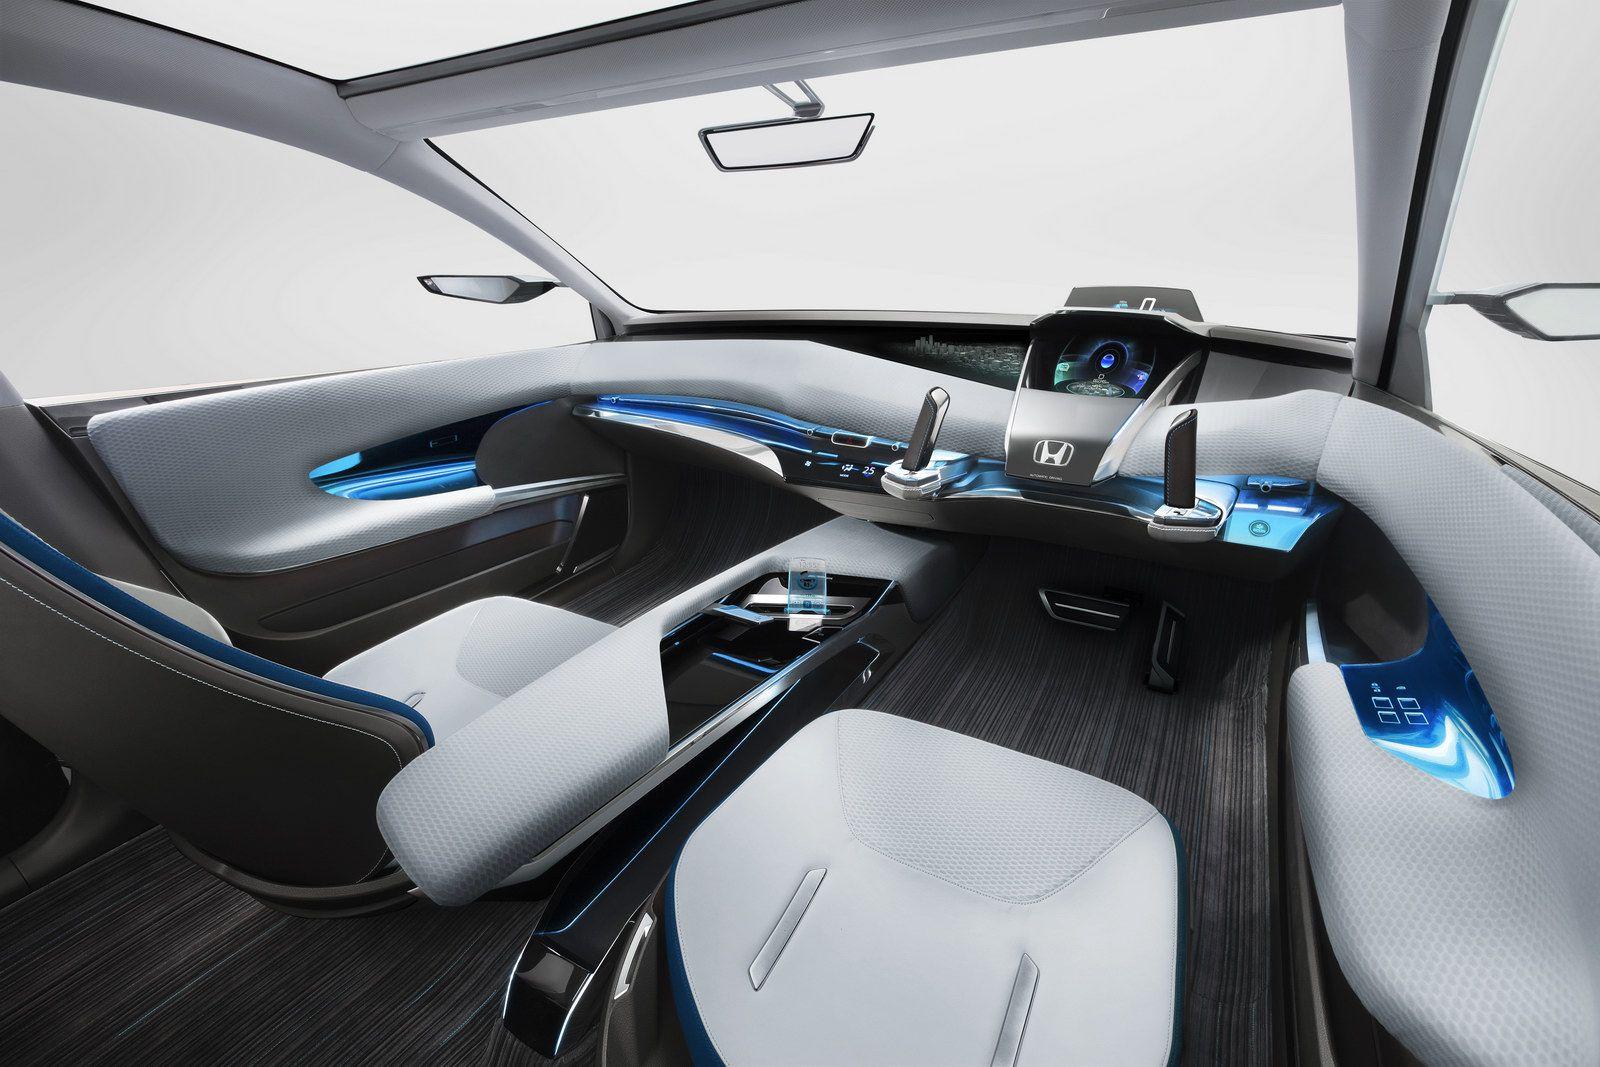 Pin By Eryu Shi On Inspiration Cars Interior Cars Car Interior